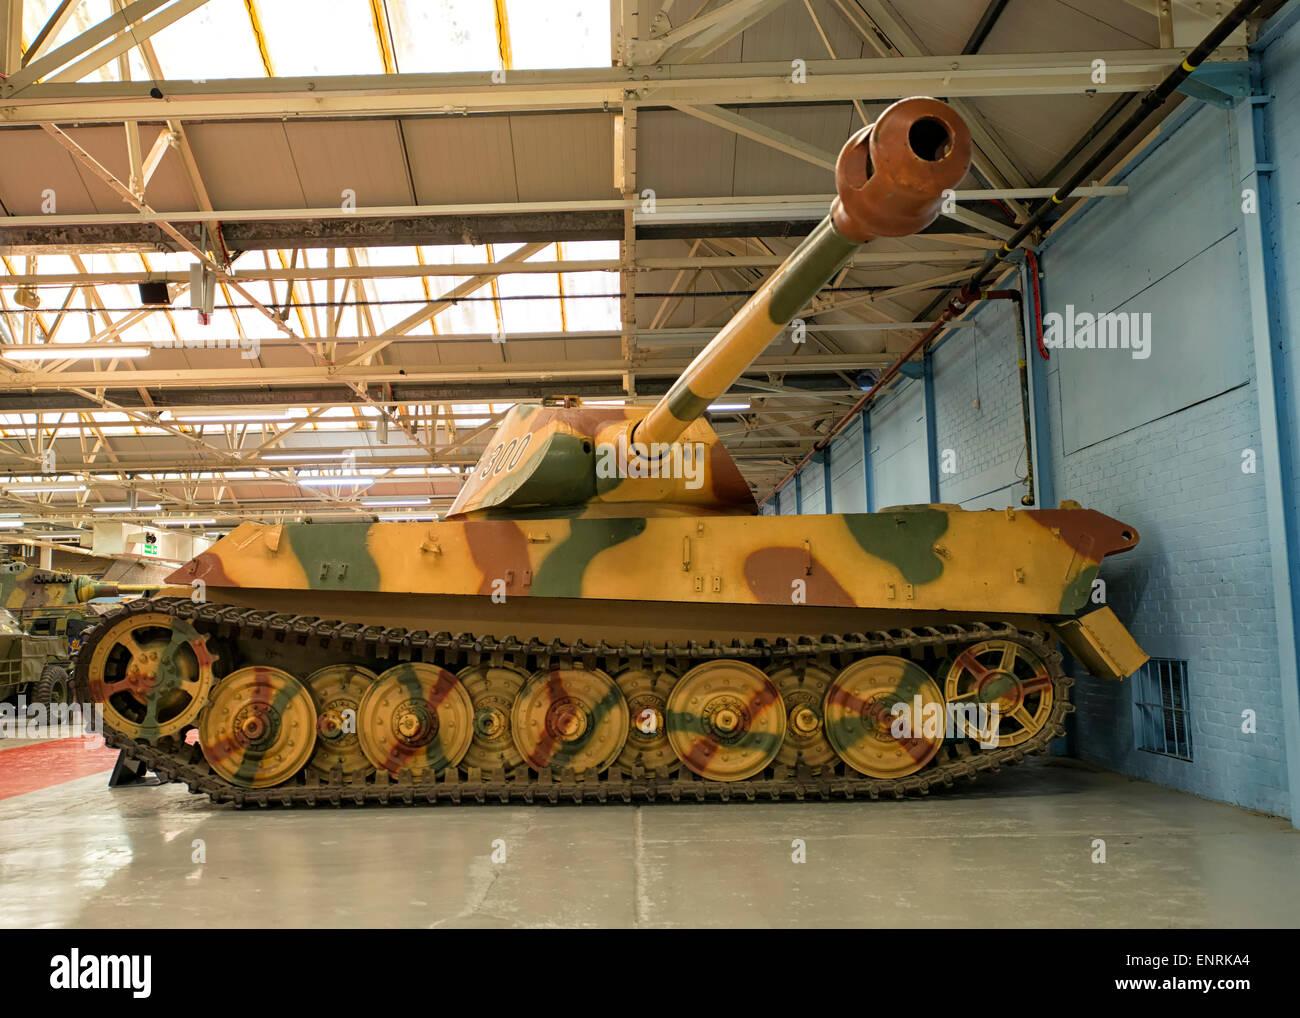 panzer vi tiger panzer im panzermuseum in bovington england stockfoto bild 82269324 alamy. Black Bedroom Furniture Sets. Home Design Ideas